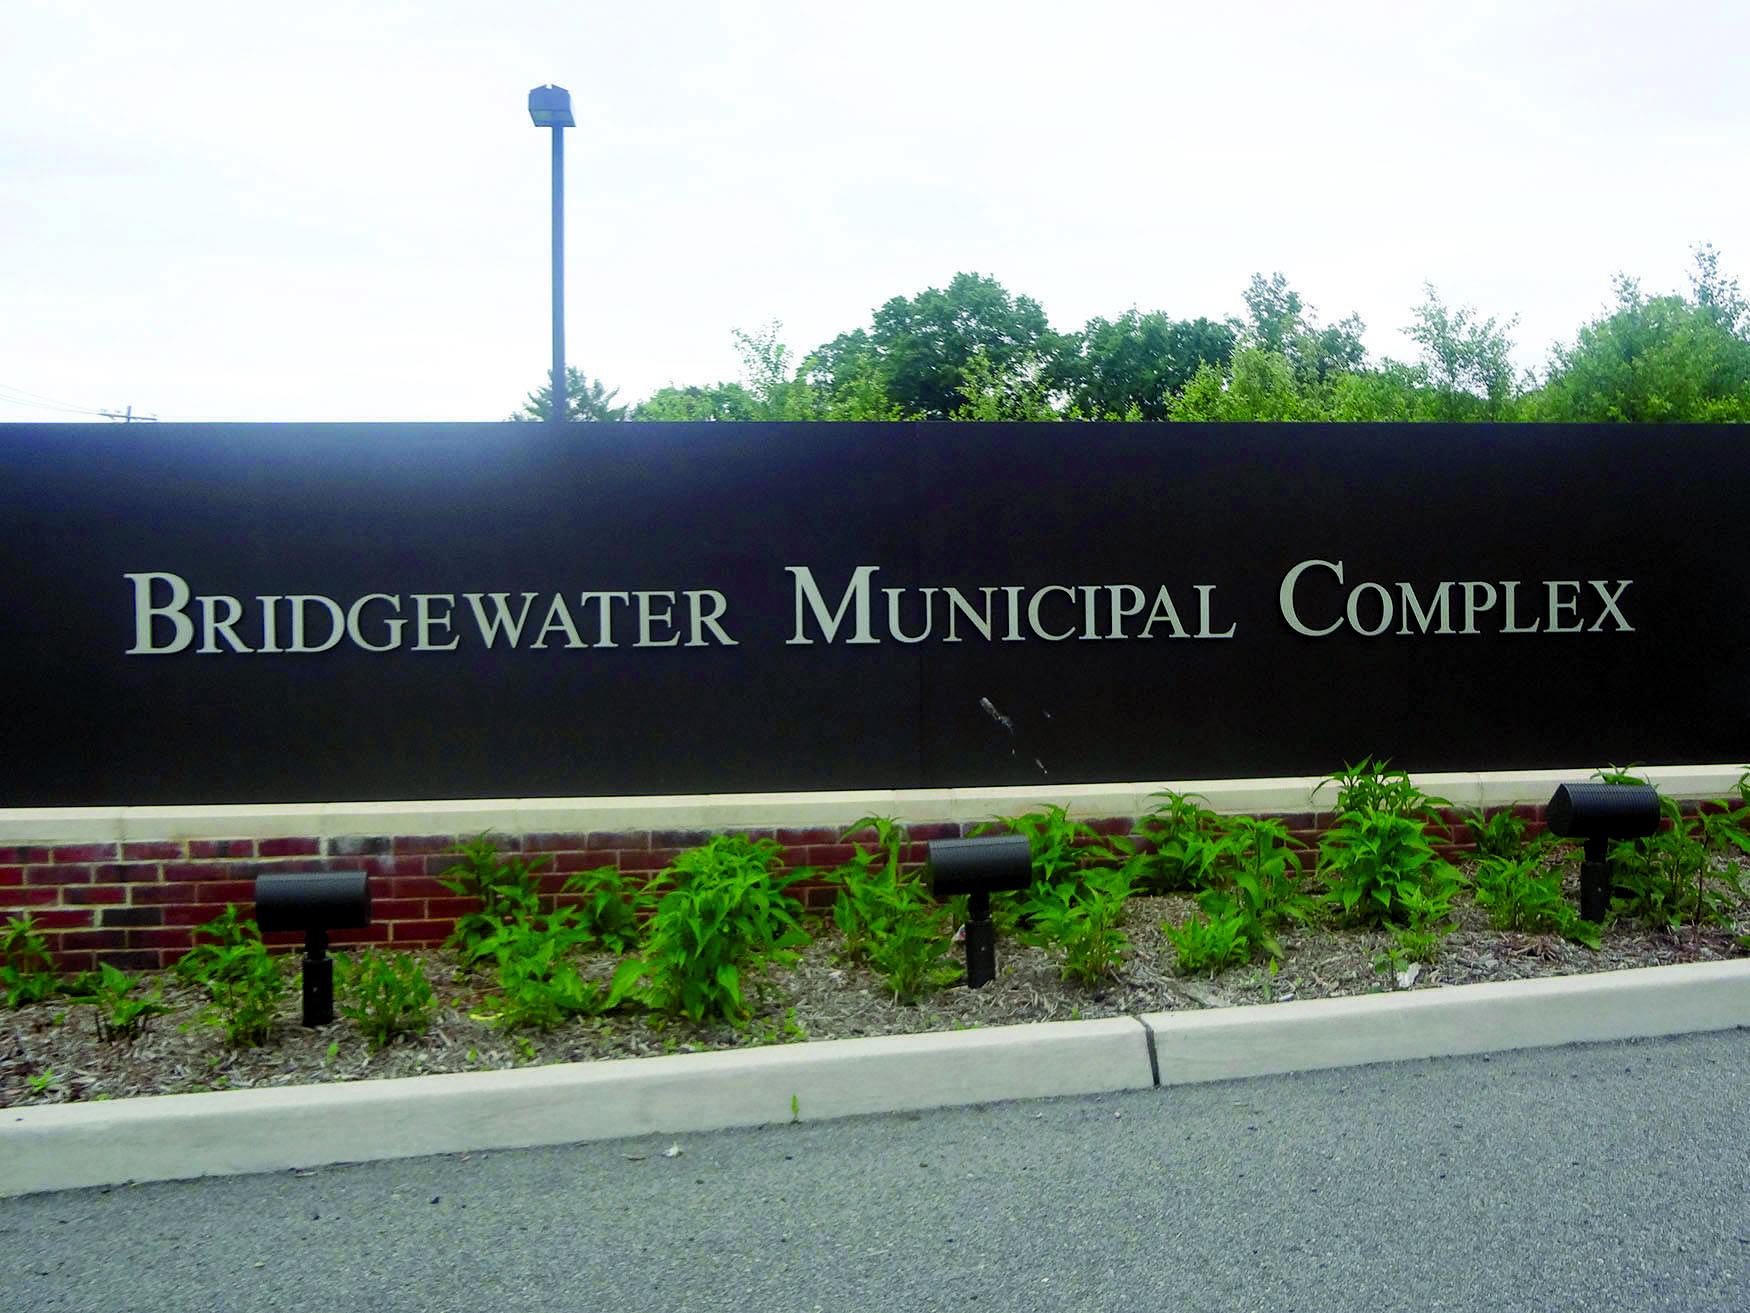 4963fb4b0e5418304ea7_Bridgewater_municipal.jpg